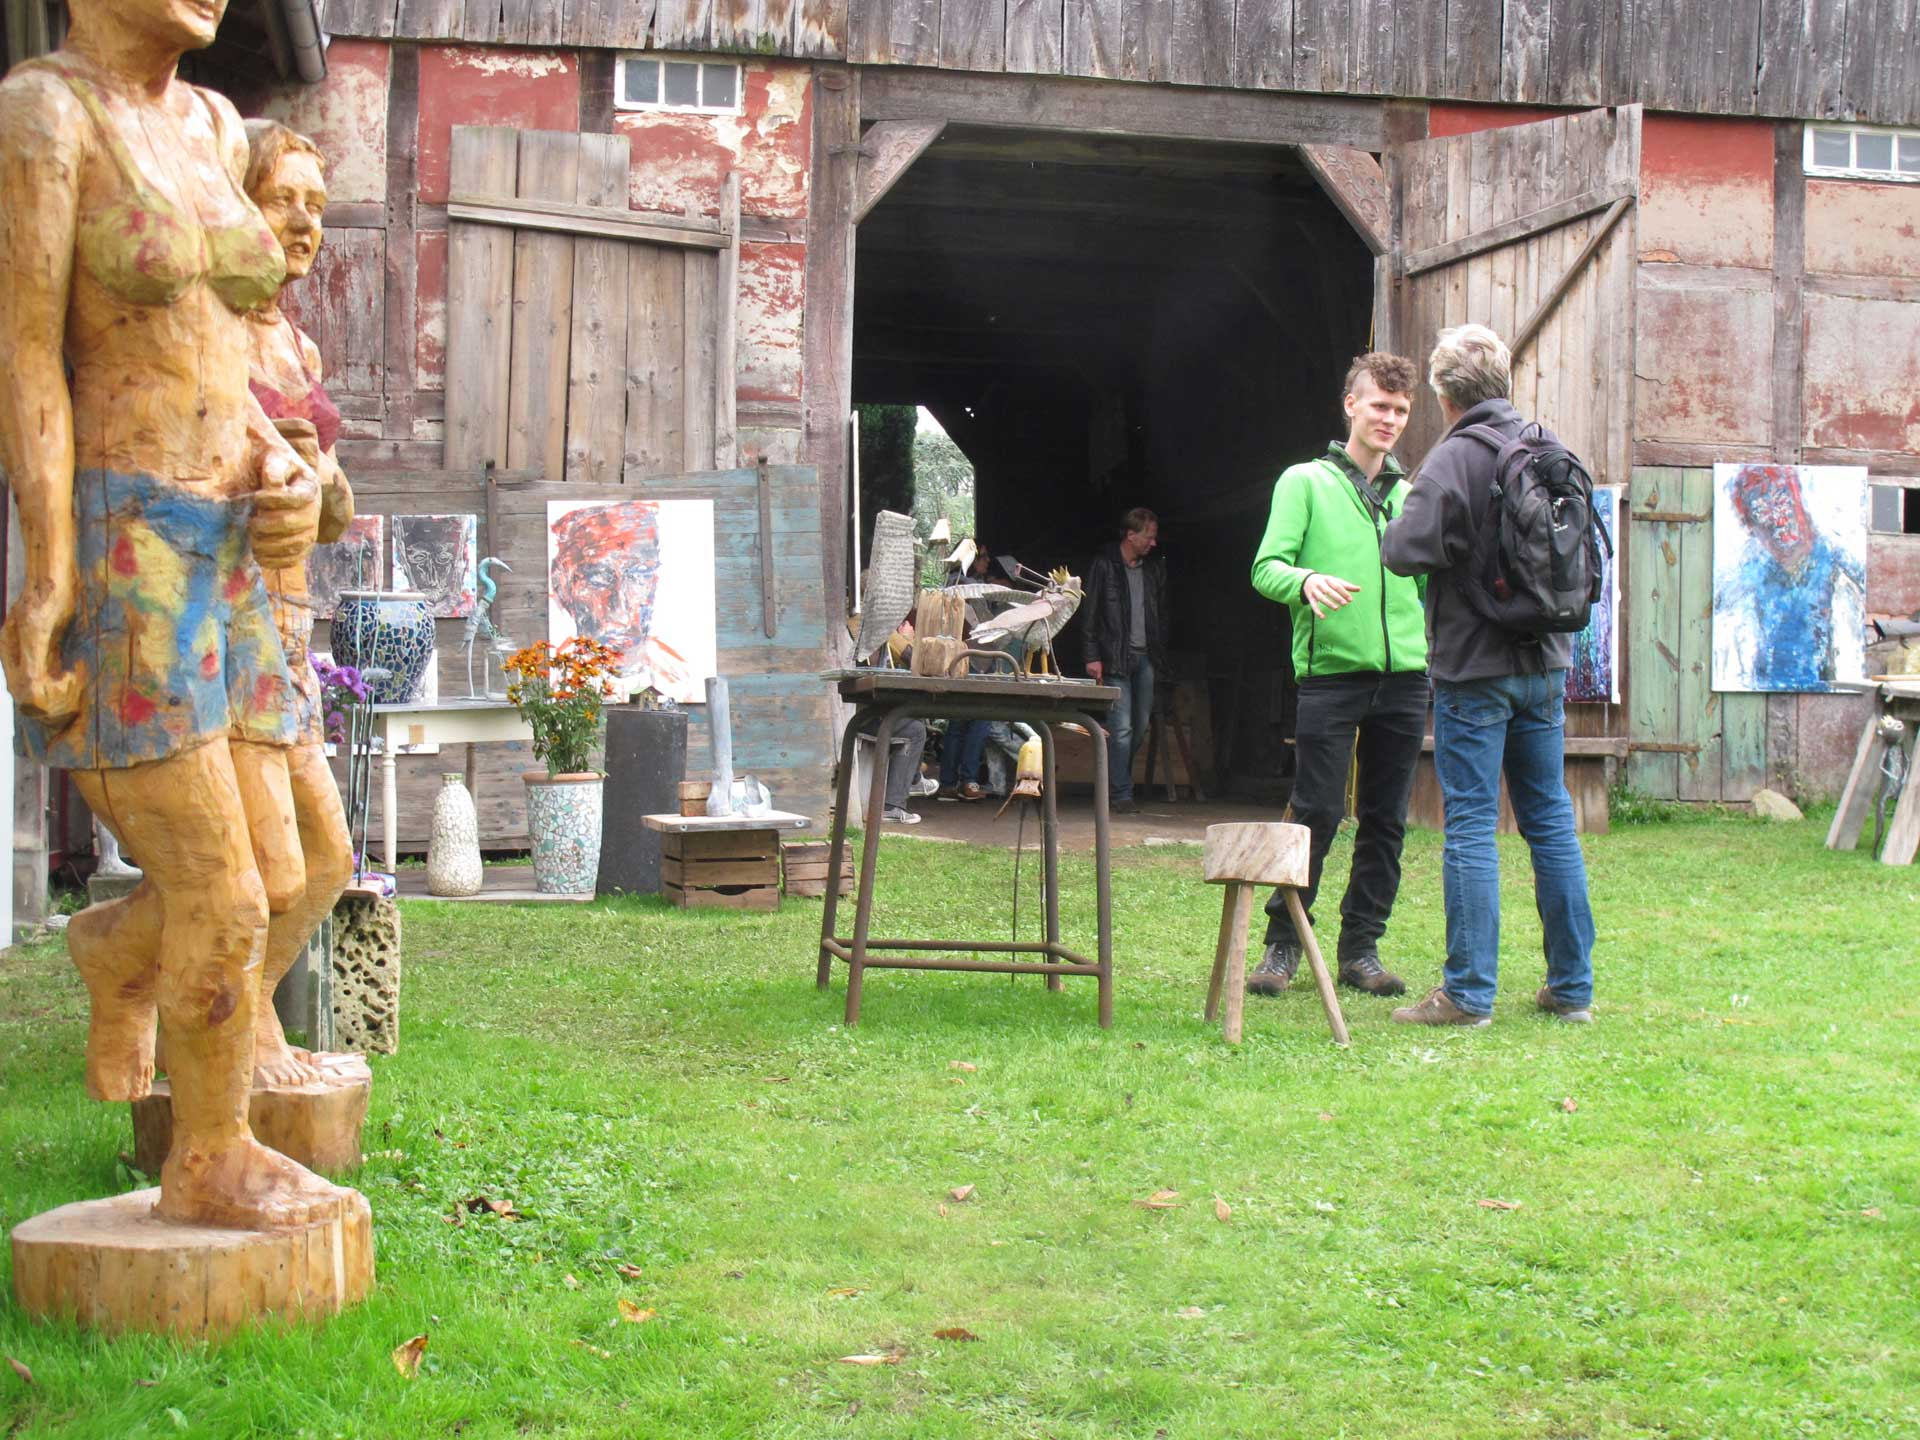 HofKunst in Häger - 2013 - Vor der Scheune